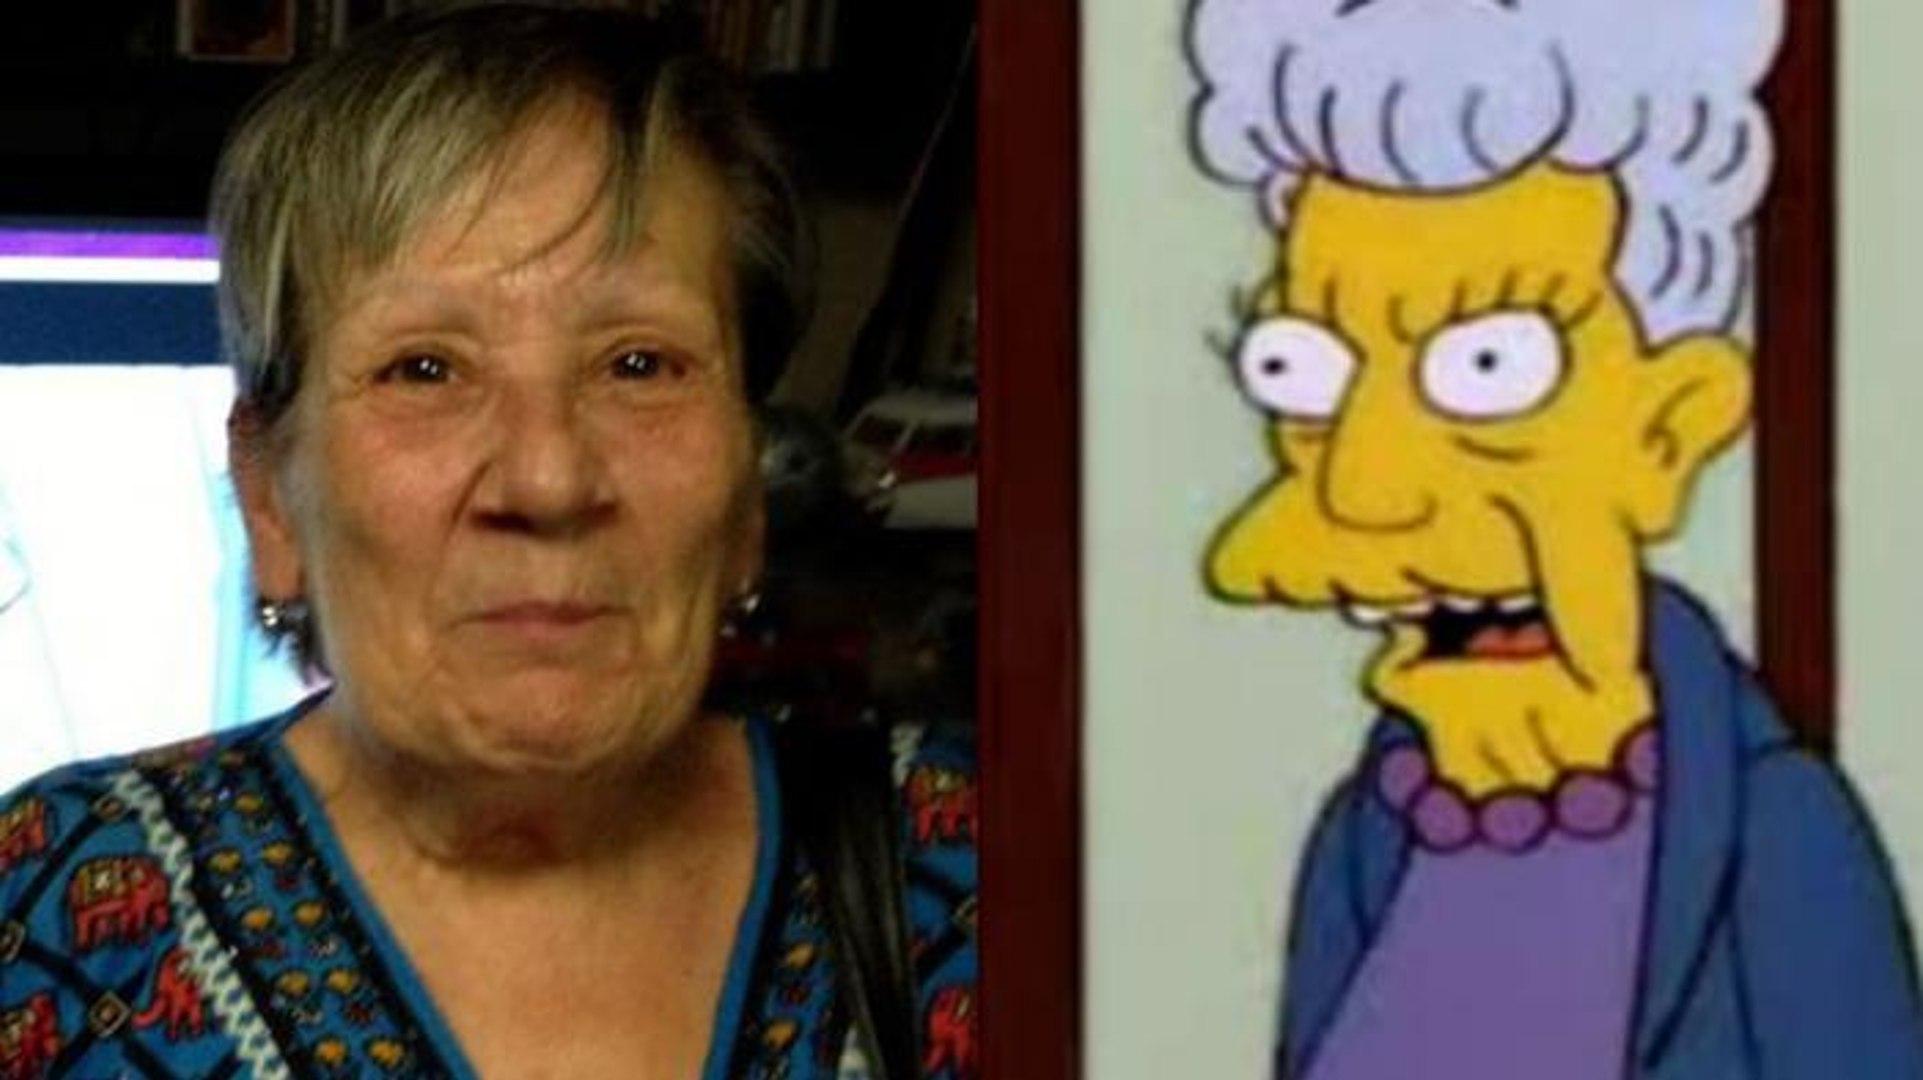 Entretenimiento | Fans de andquot;Los Simpsonsandquot; lloran la muerte de la voz de la mamá de Skin